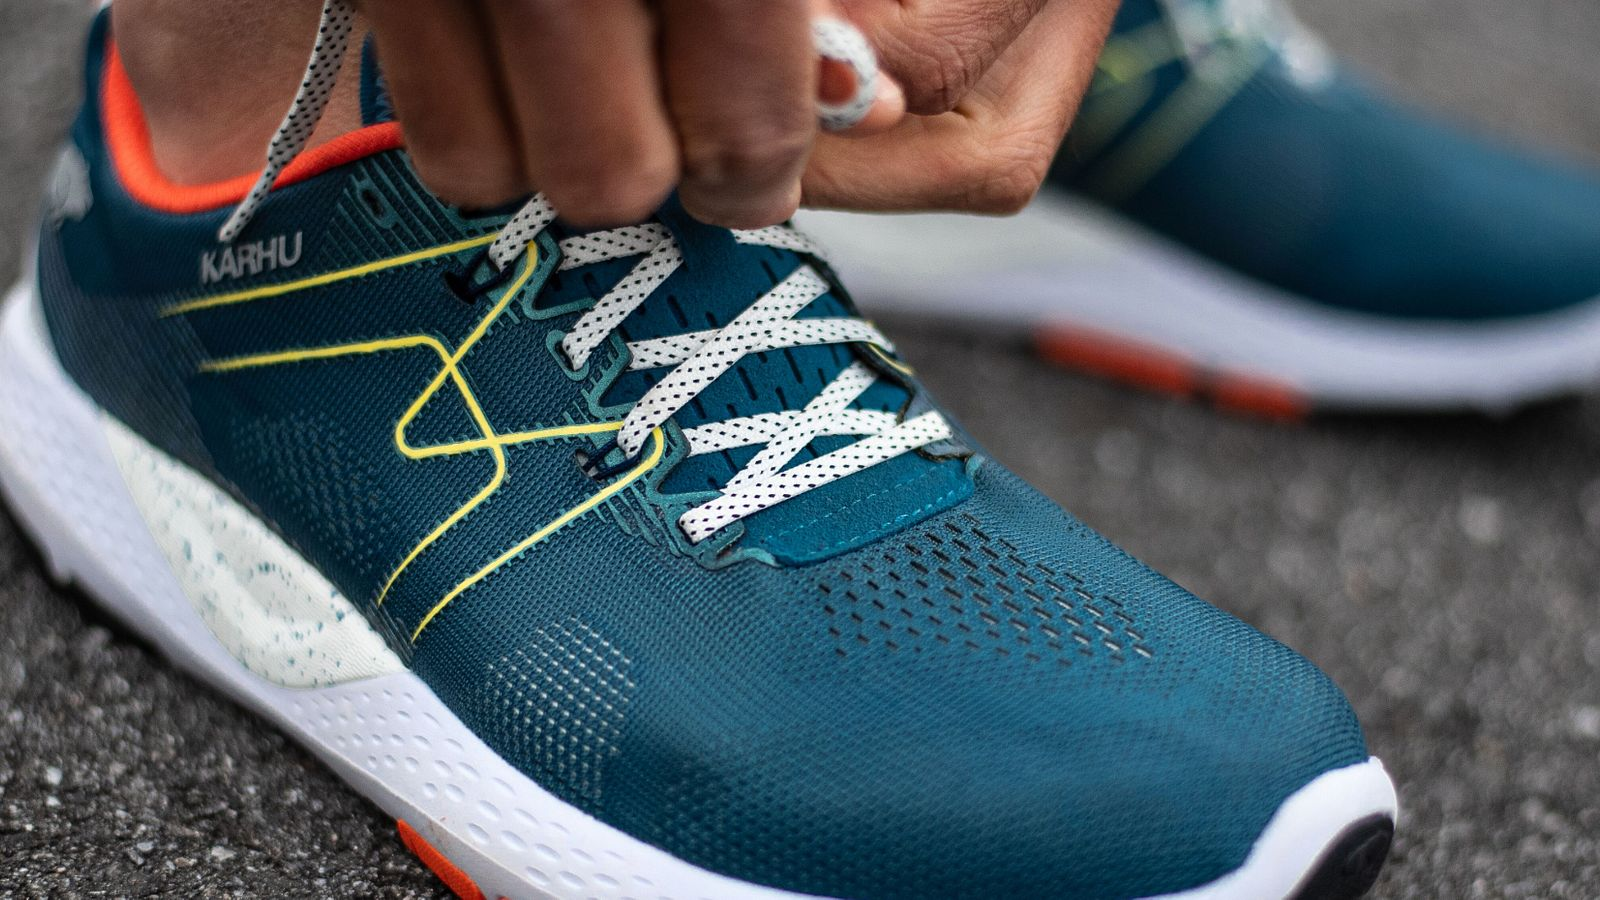 Best Karhu Running Shoes 2020   Buyer's